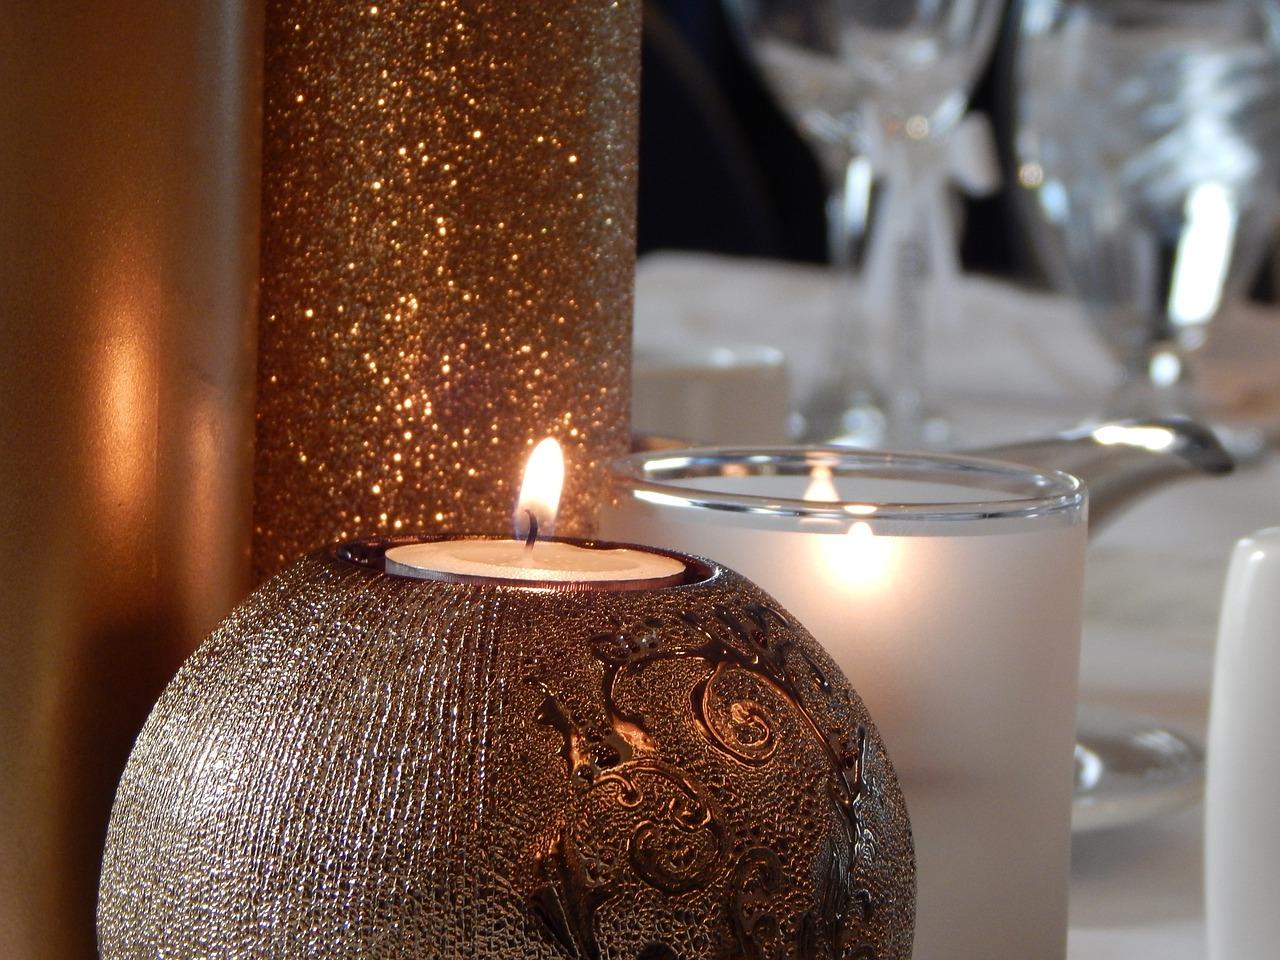 candle-912773_1280.jpg